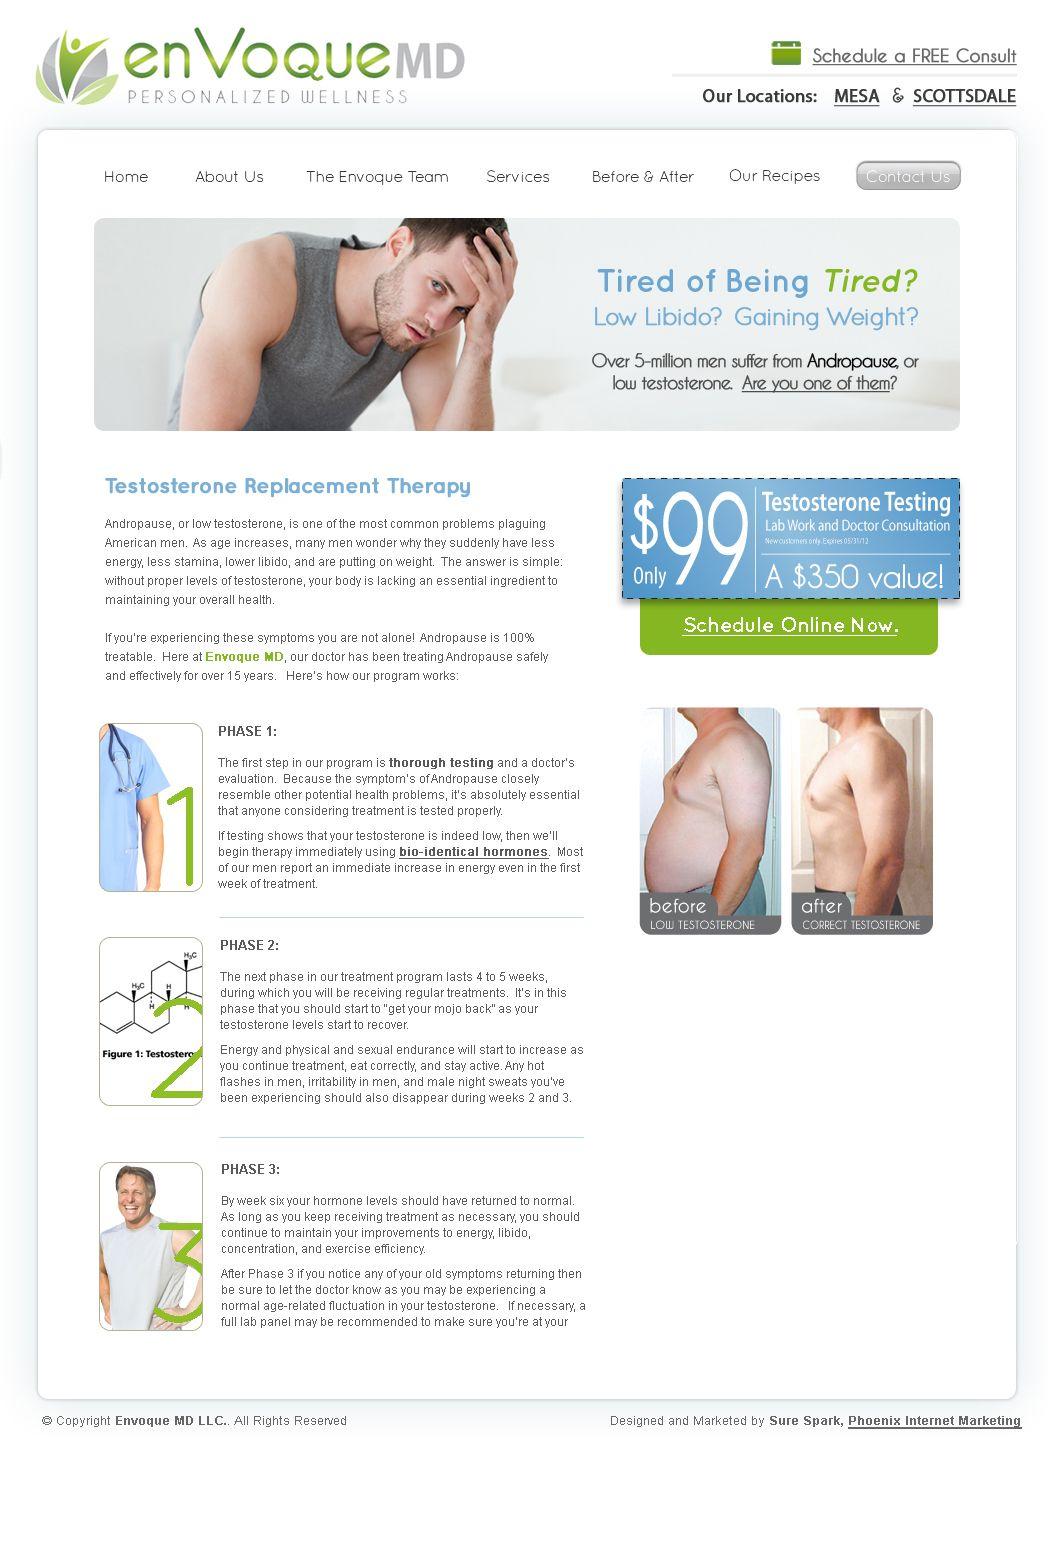 Pin By Melissa Weinberger On Sure Spark Design Portfolio Medical